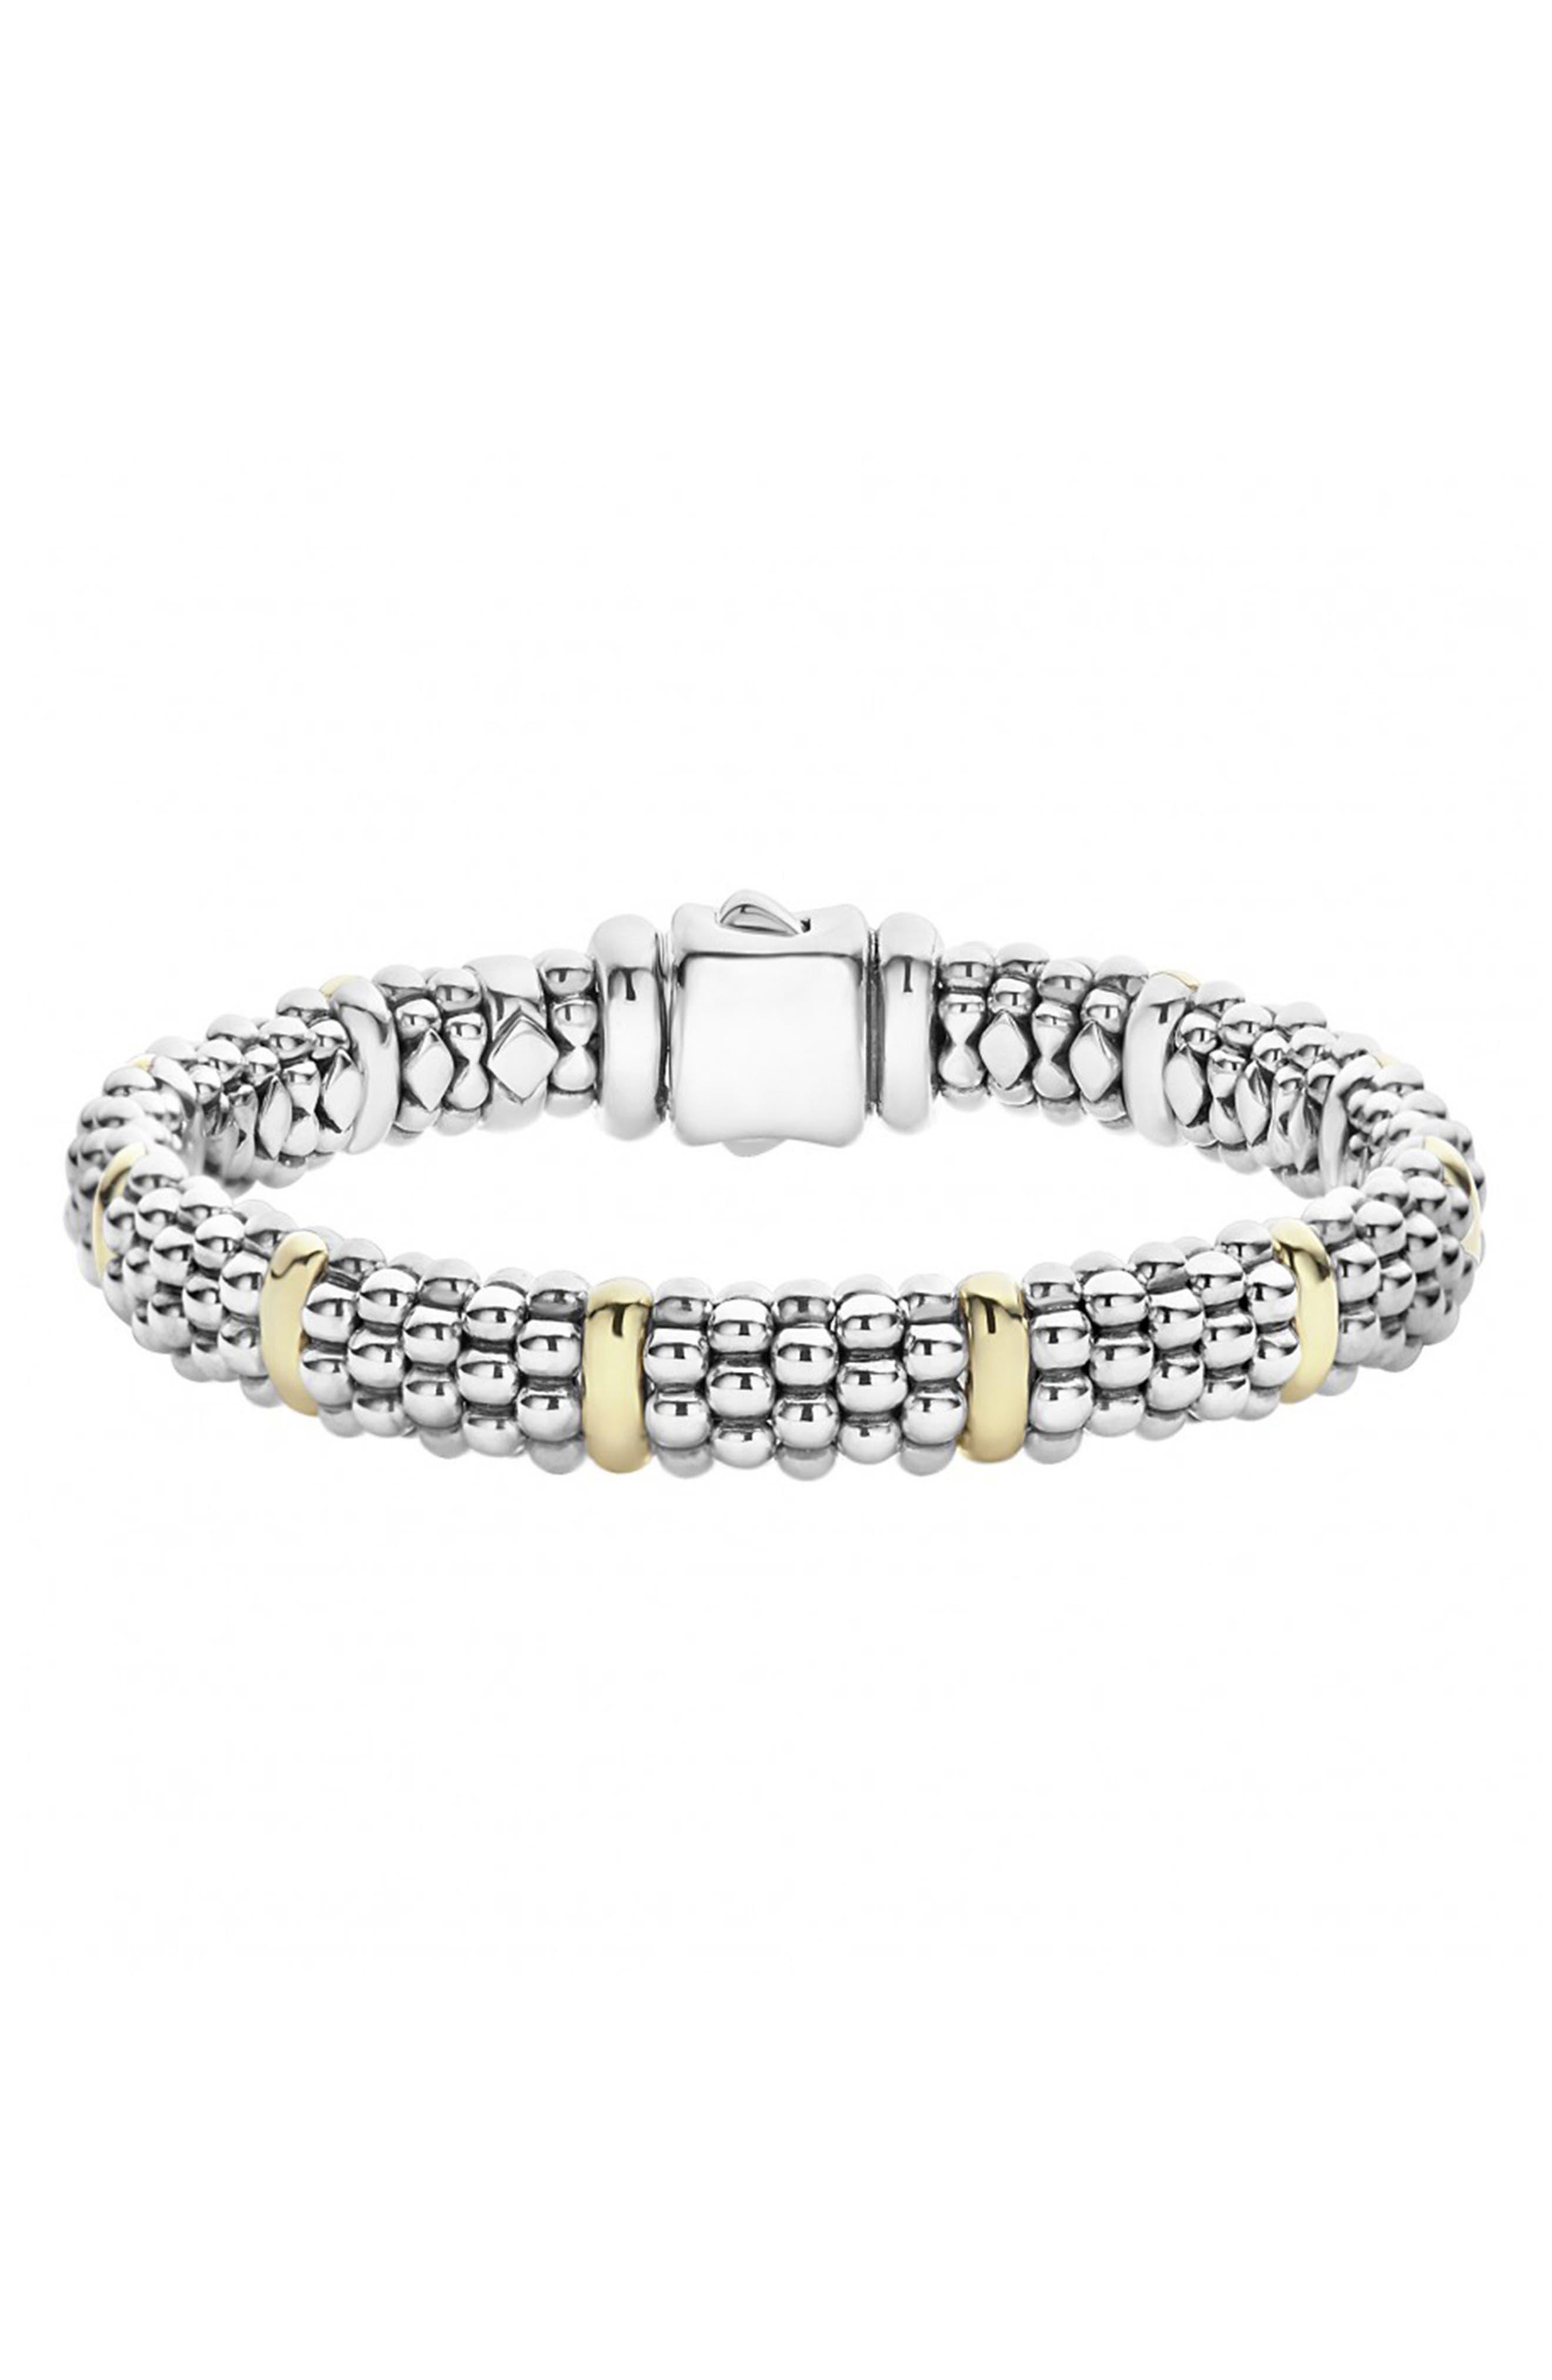 Oval Rope Caviar Bracelet,                         Main,                         color, Silver/ Gold